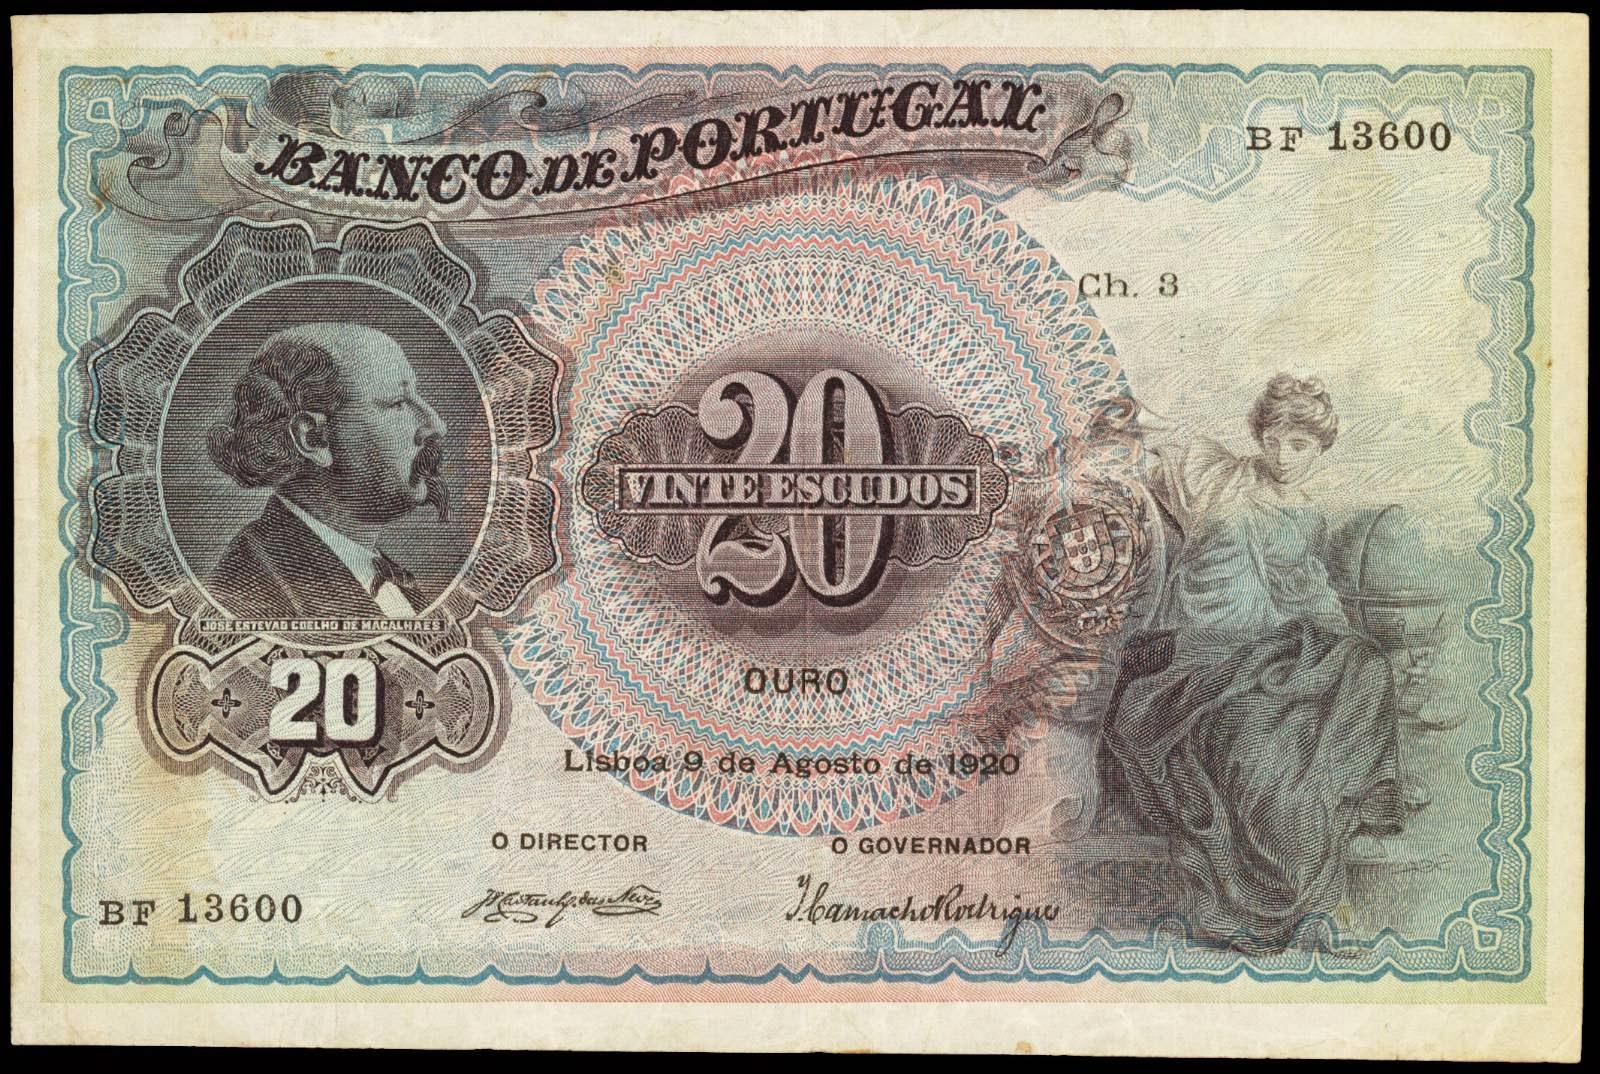 Portugal 20 Escudos banknote 1920 Jose Estevao